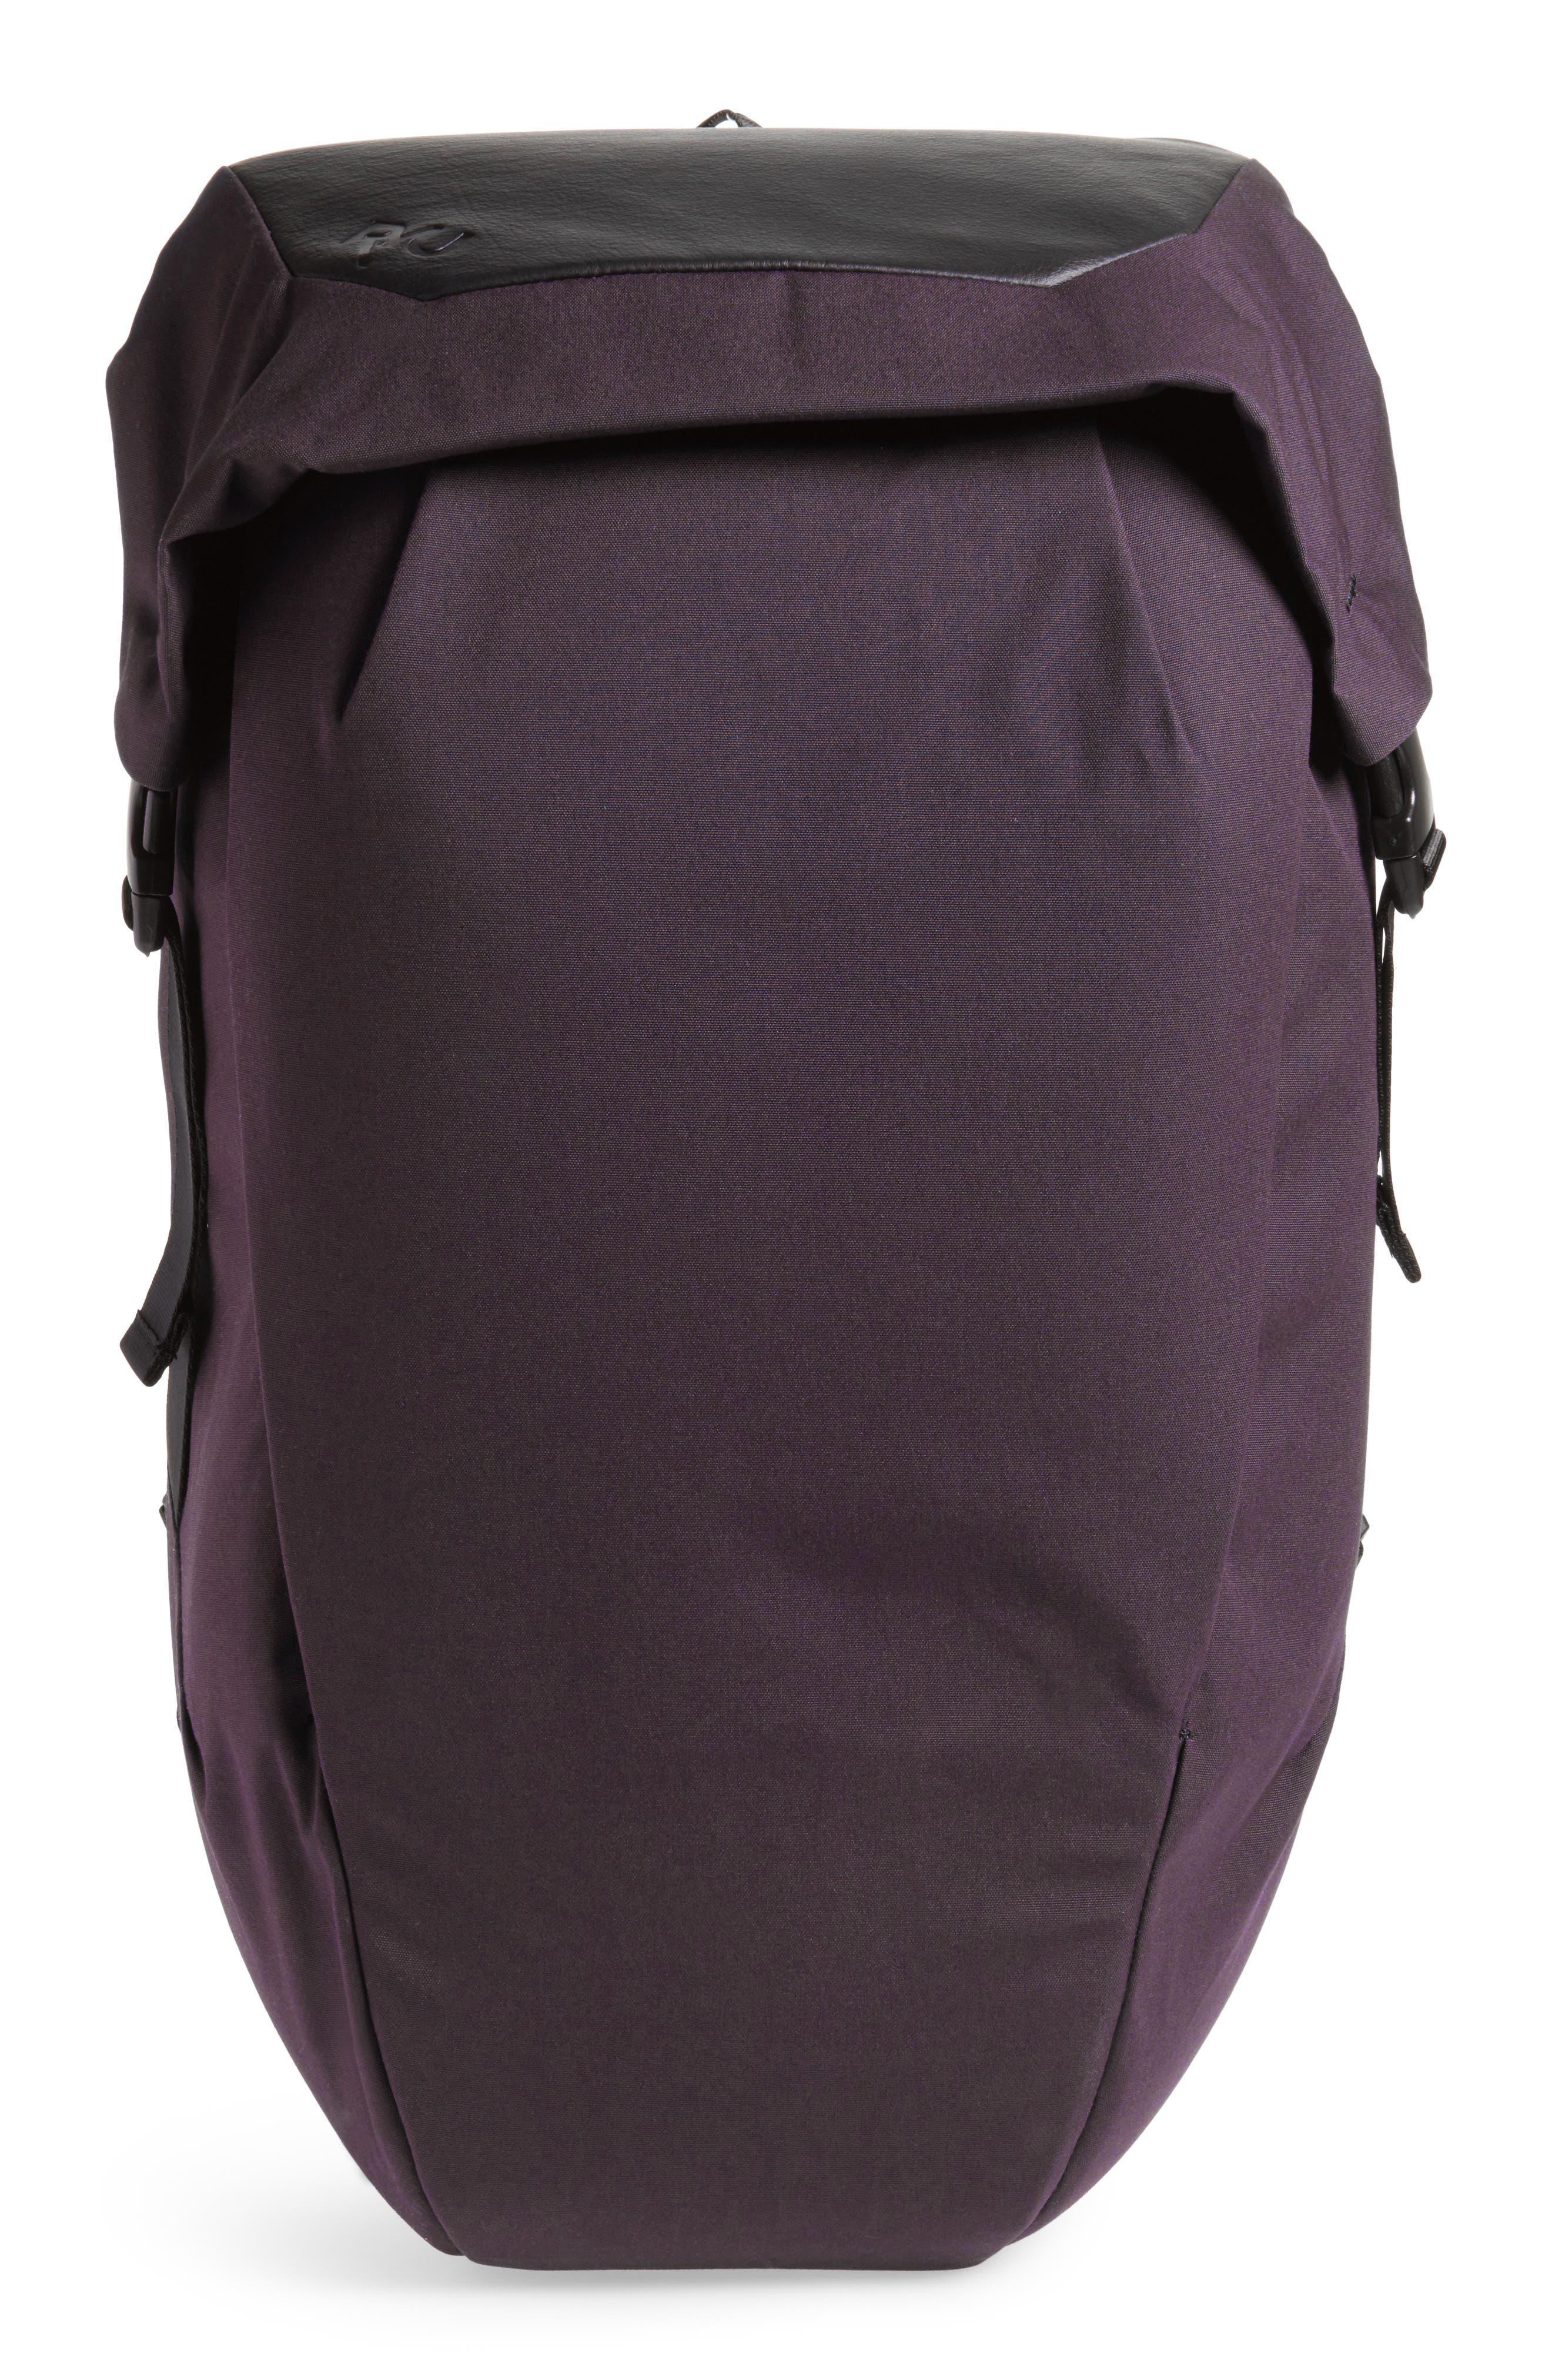 RYU Locker Pack Lux Backpack (24 Liter)